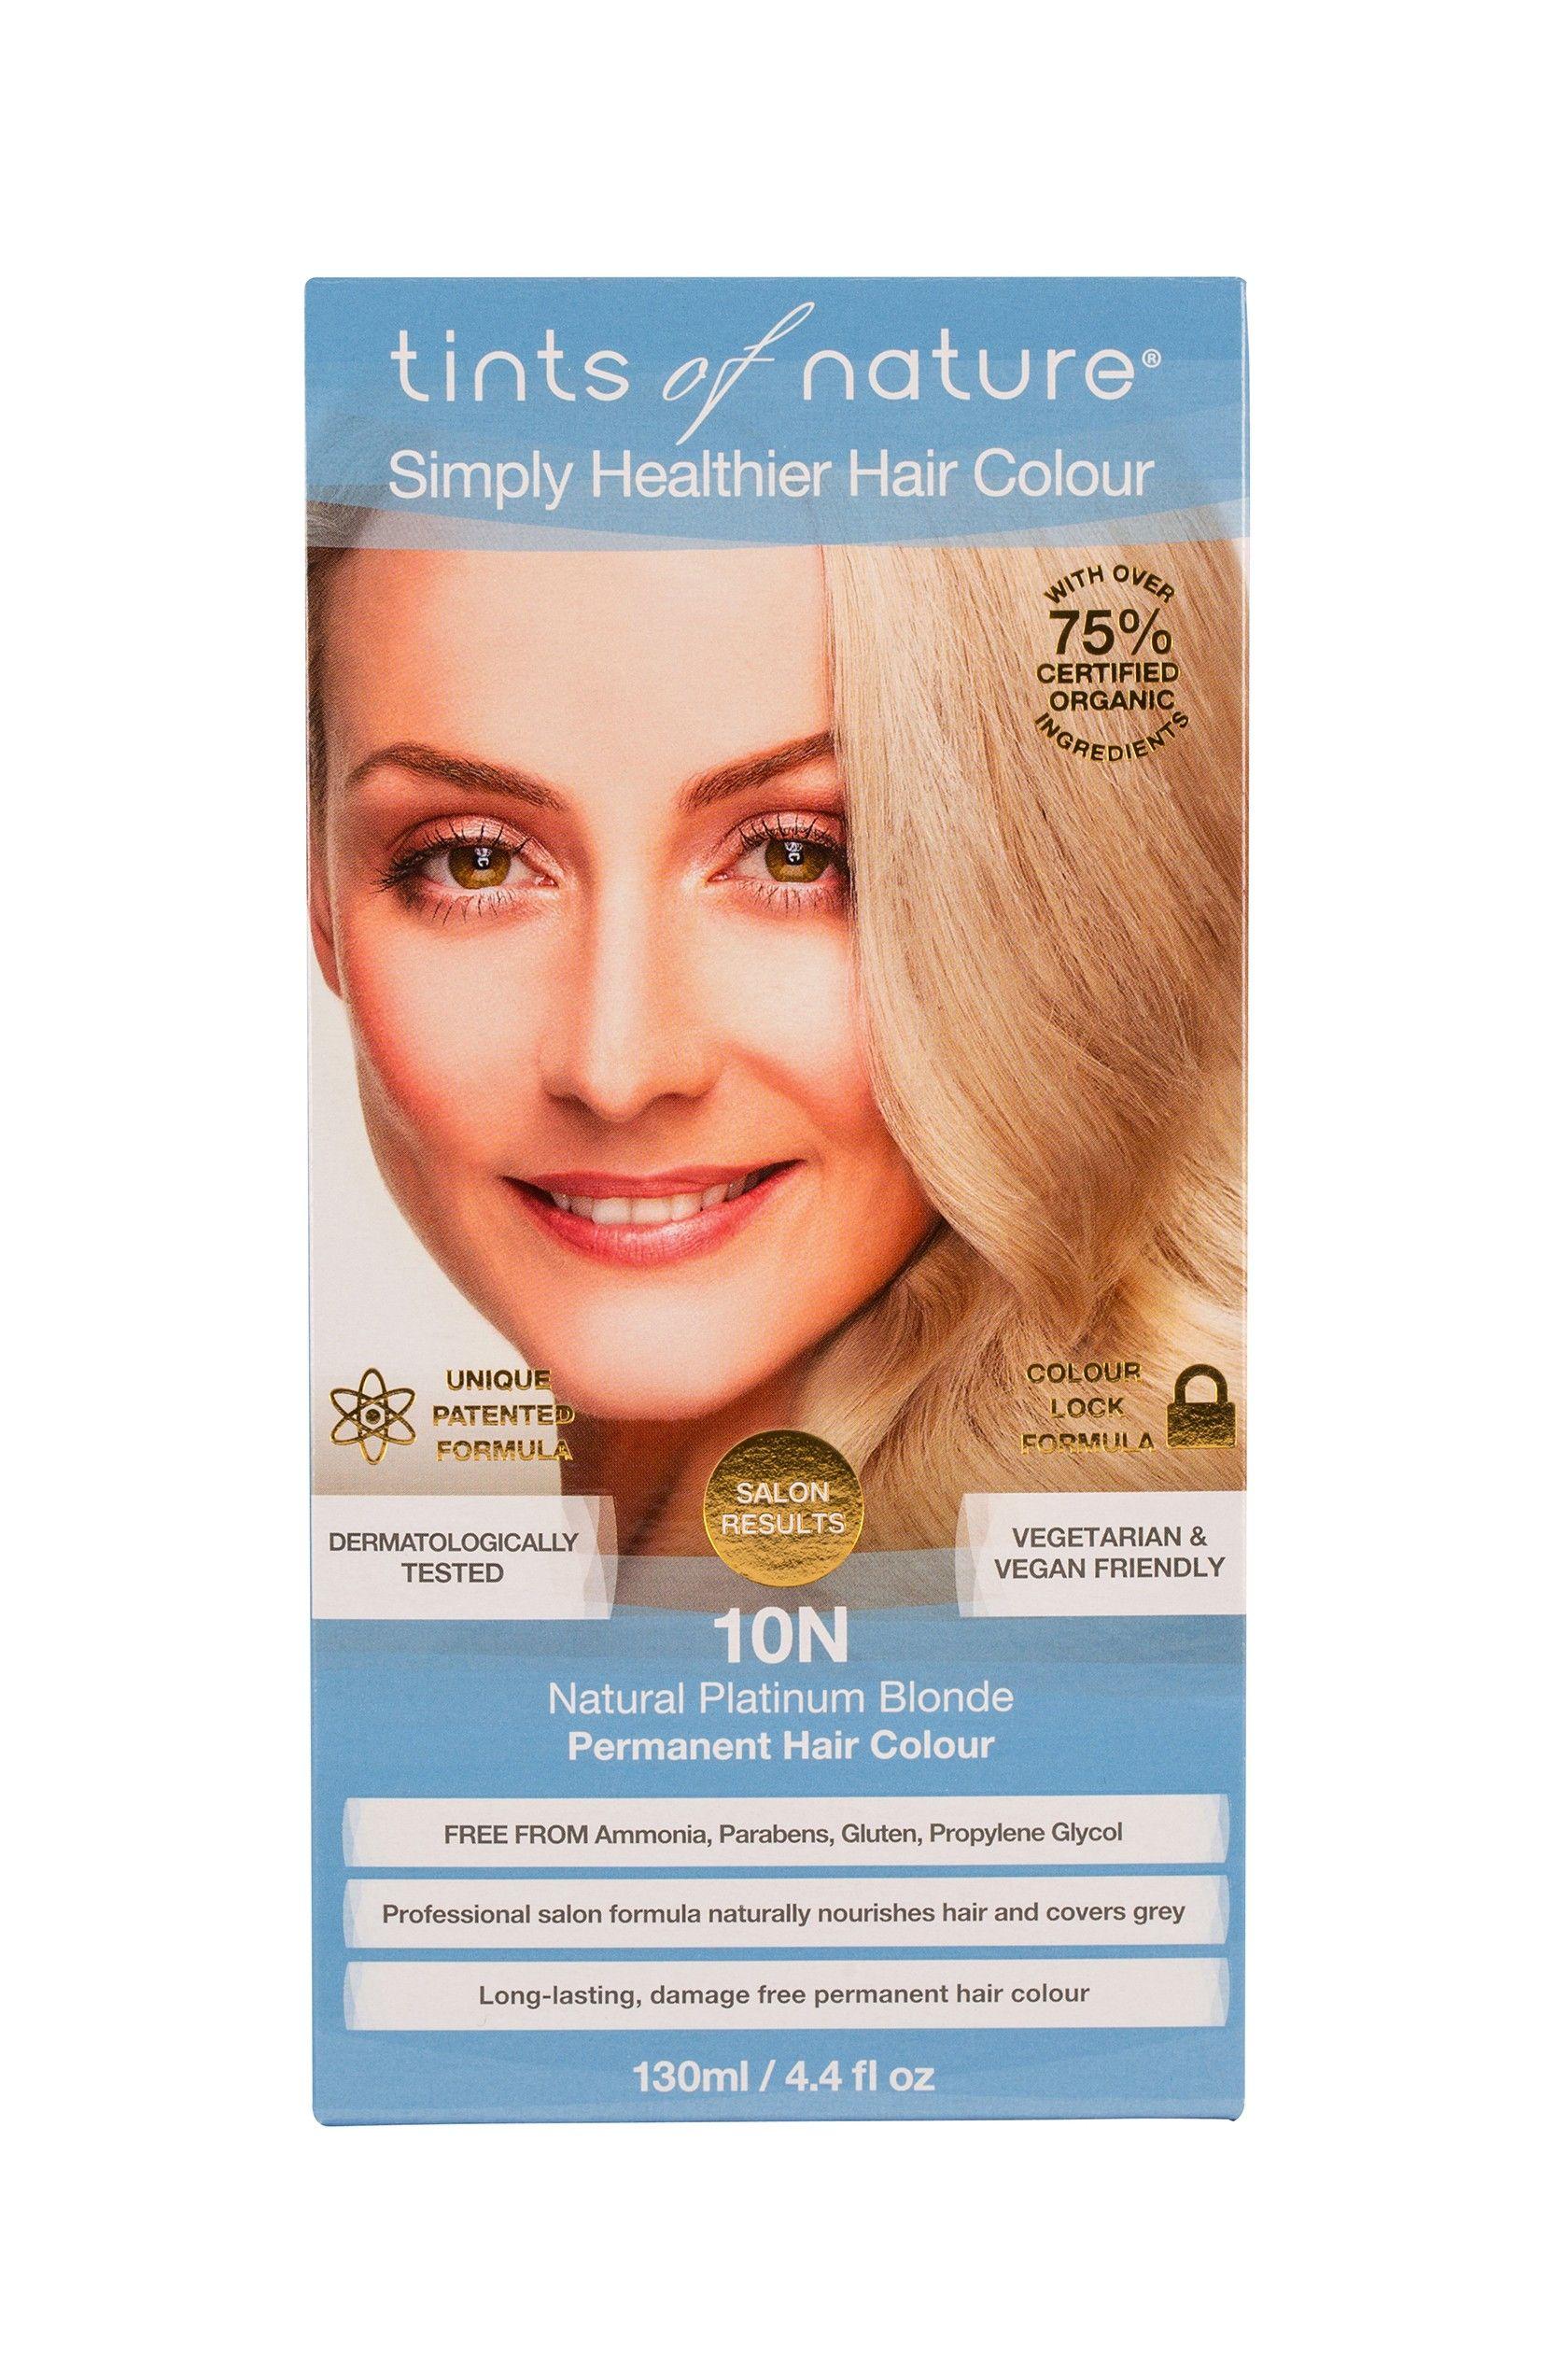 10n Natural Platinum Blonde Permanent Hair Colour Cruelty Free